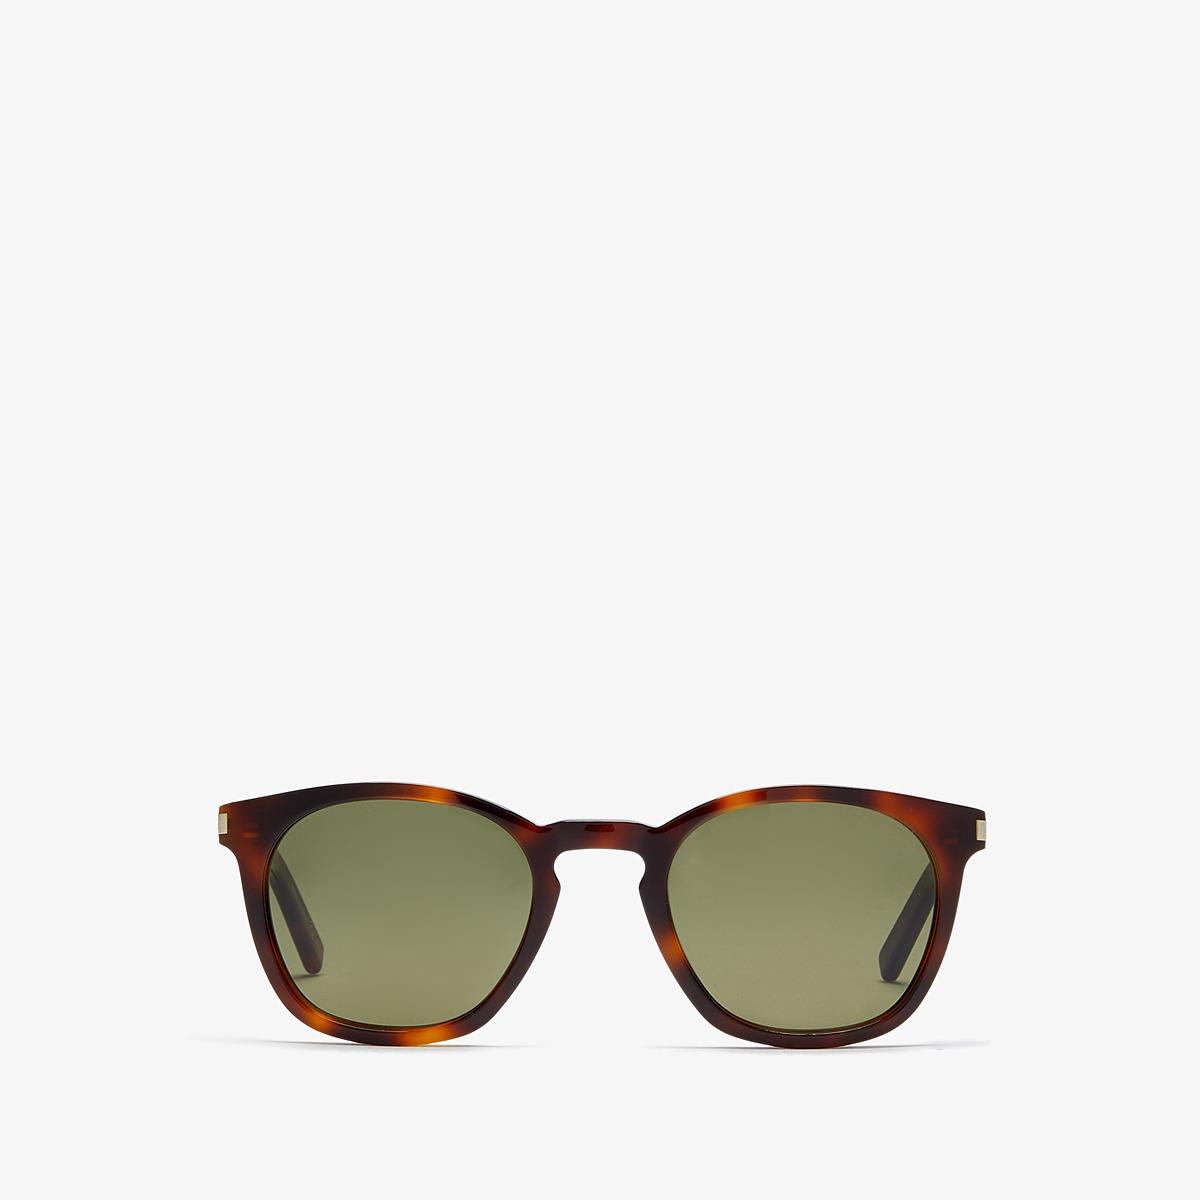 Saint Laurent - SL 28 (Light Havana/Green) Fashion Sunglasses